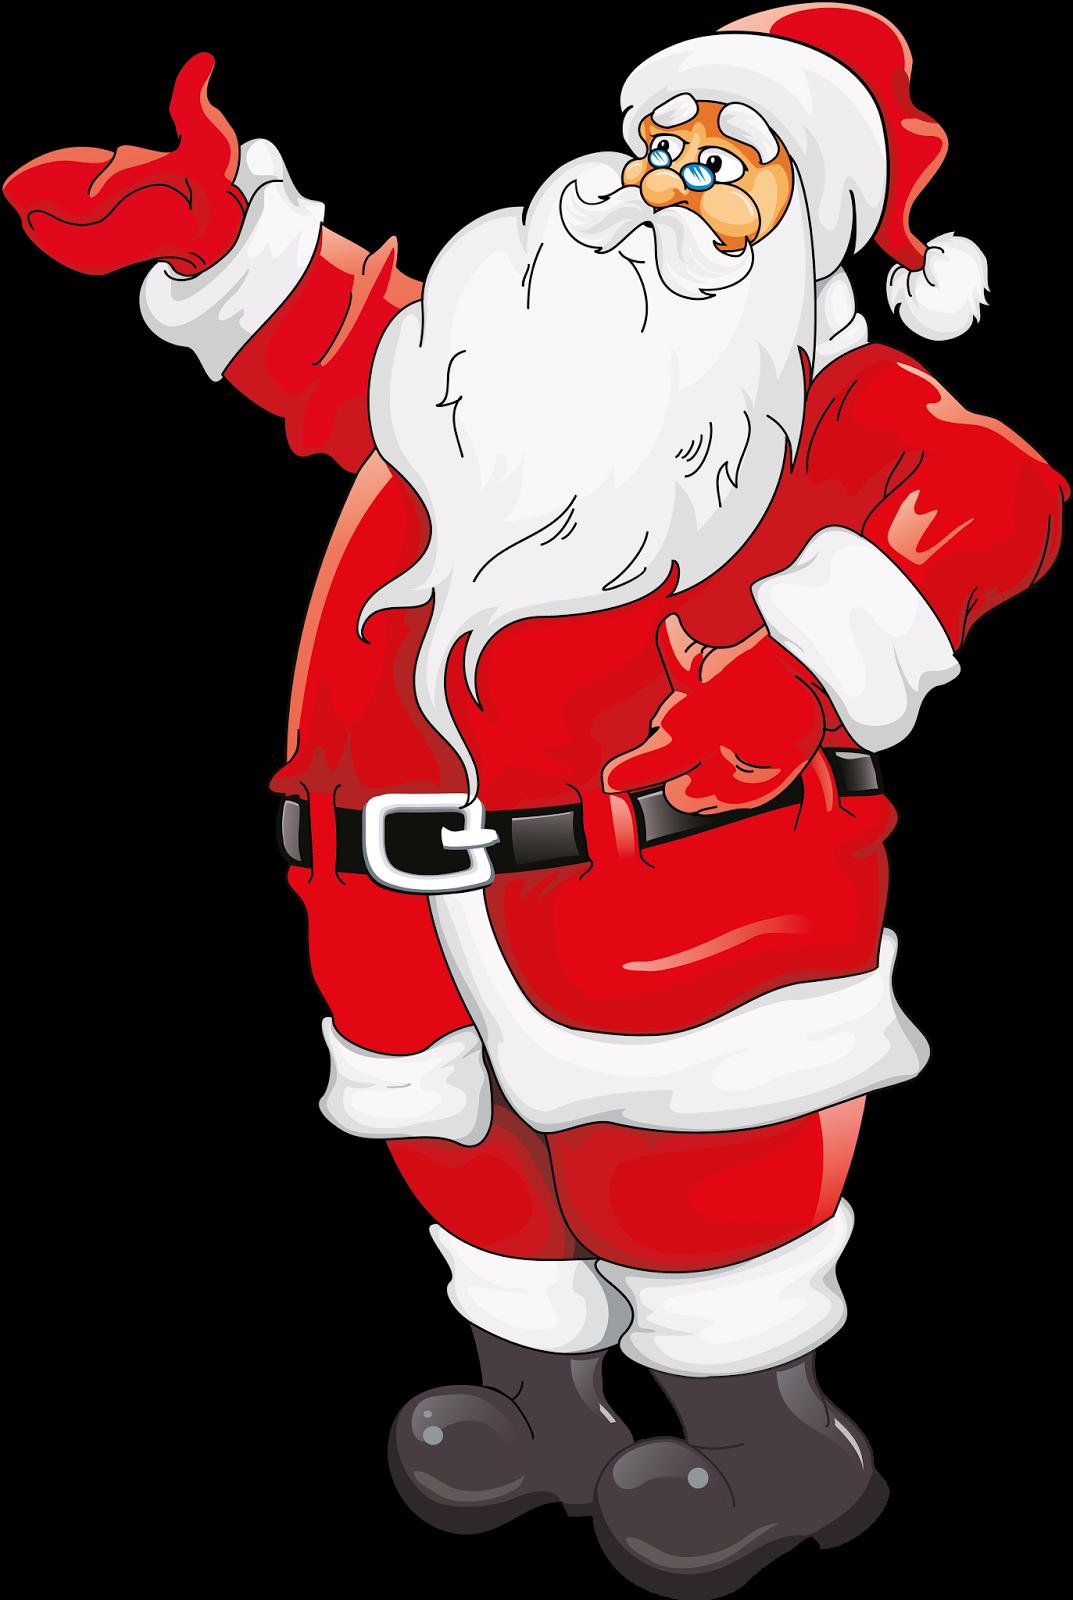 Marcos Gratis Para Fotos Scrap Santa Claus Saint Nicholas Father Christmas Para Diseno E Arte De Navidad Arte Jardin De Navidad Dibujos Animados Navidenos